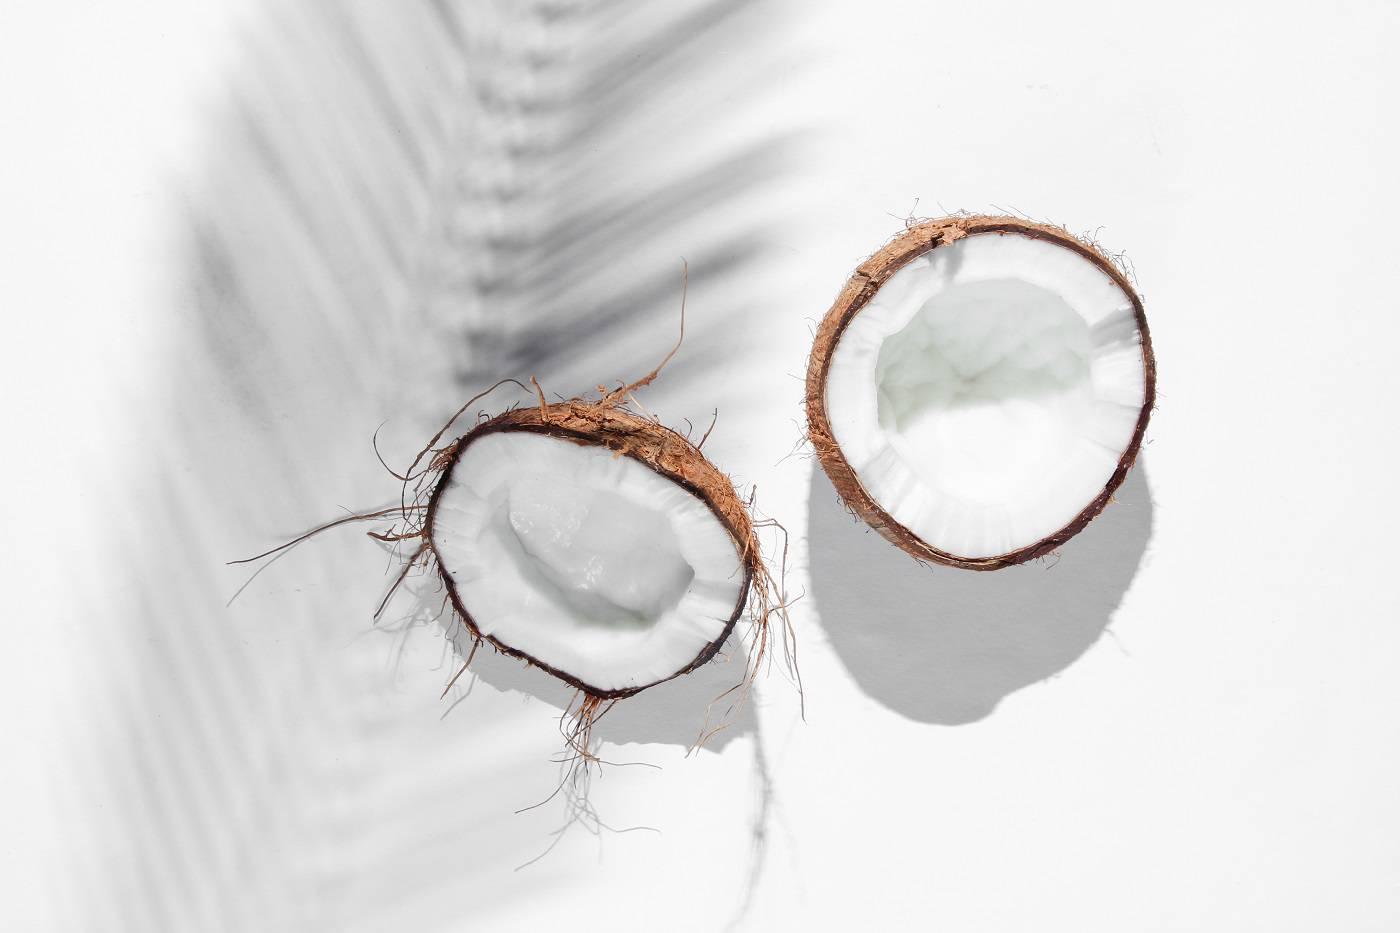 Halves coconut with shadows